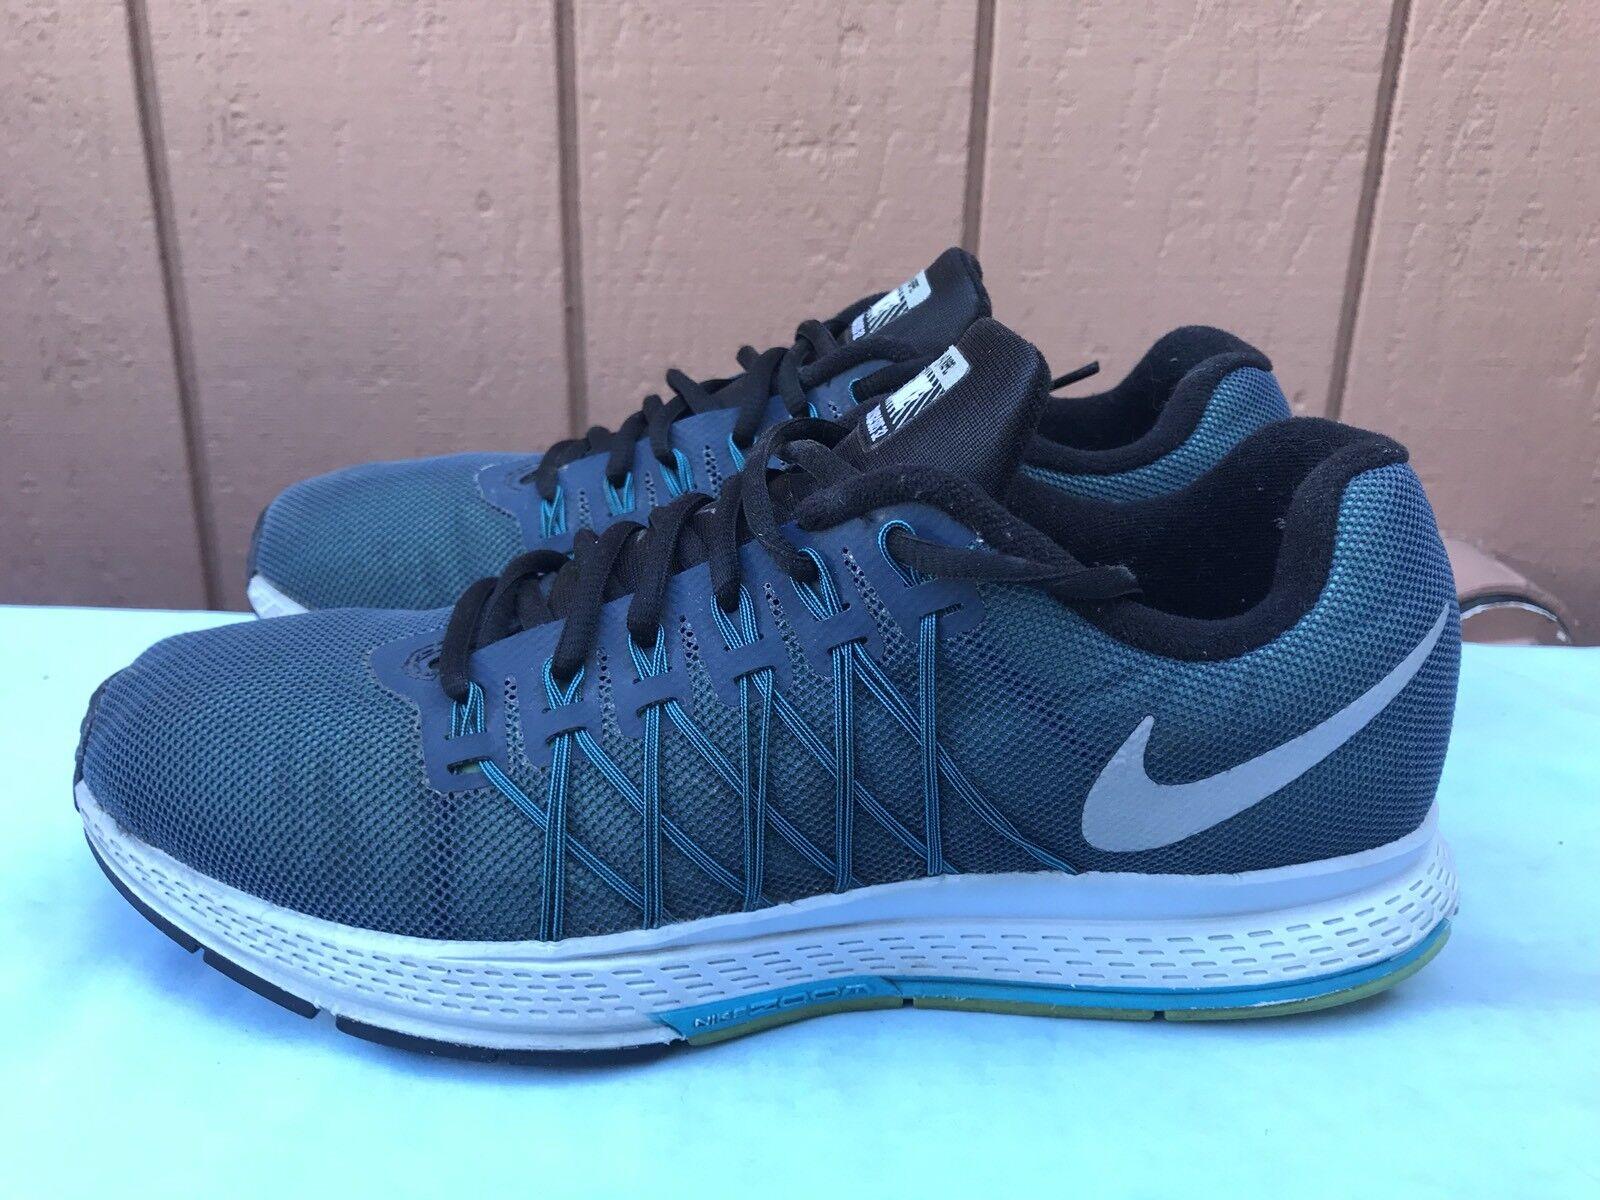 EUC! Nike Air Zoom Pegasus 32 Flash H2O Uomo 8.5 Running Trainers 806576 400 A6